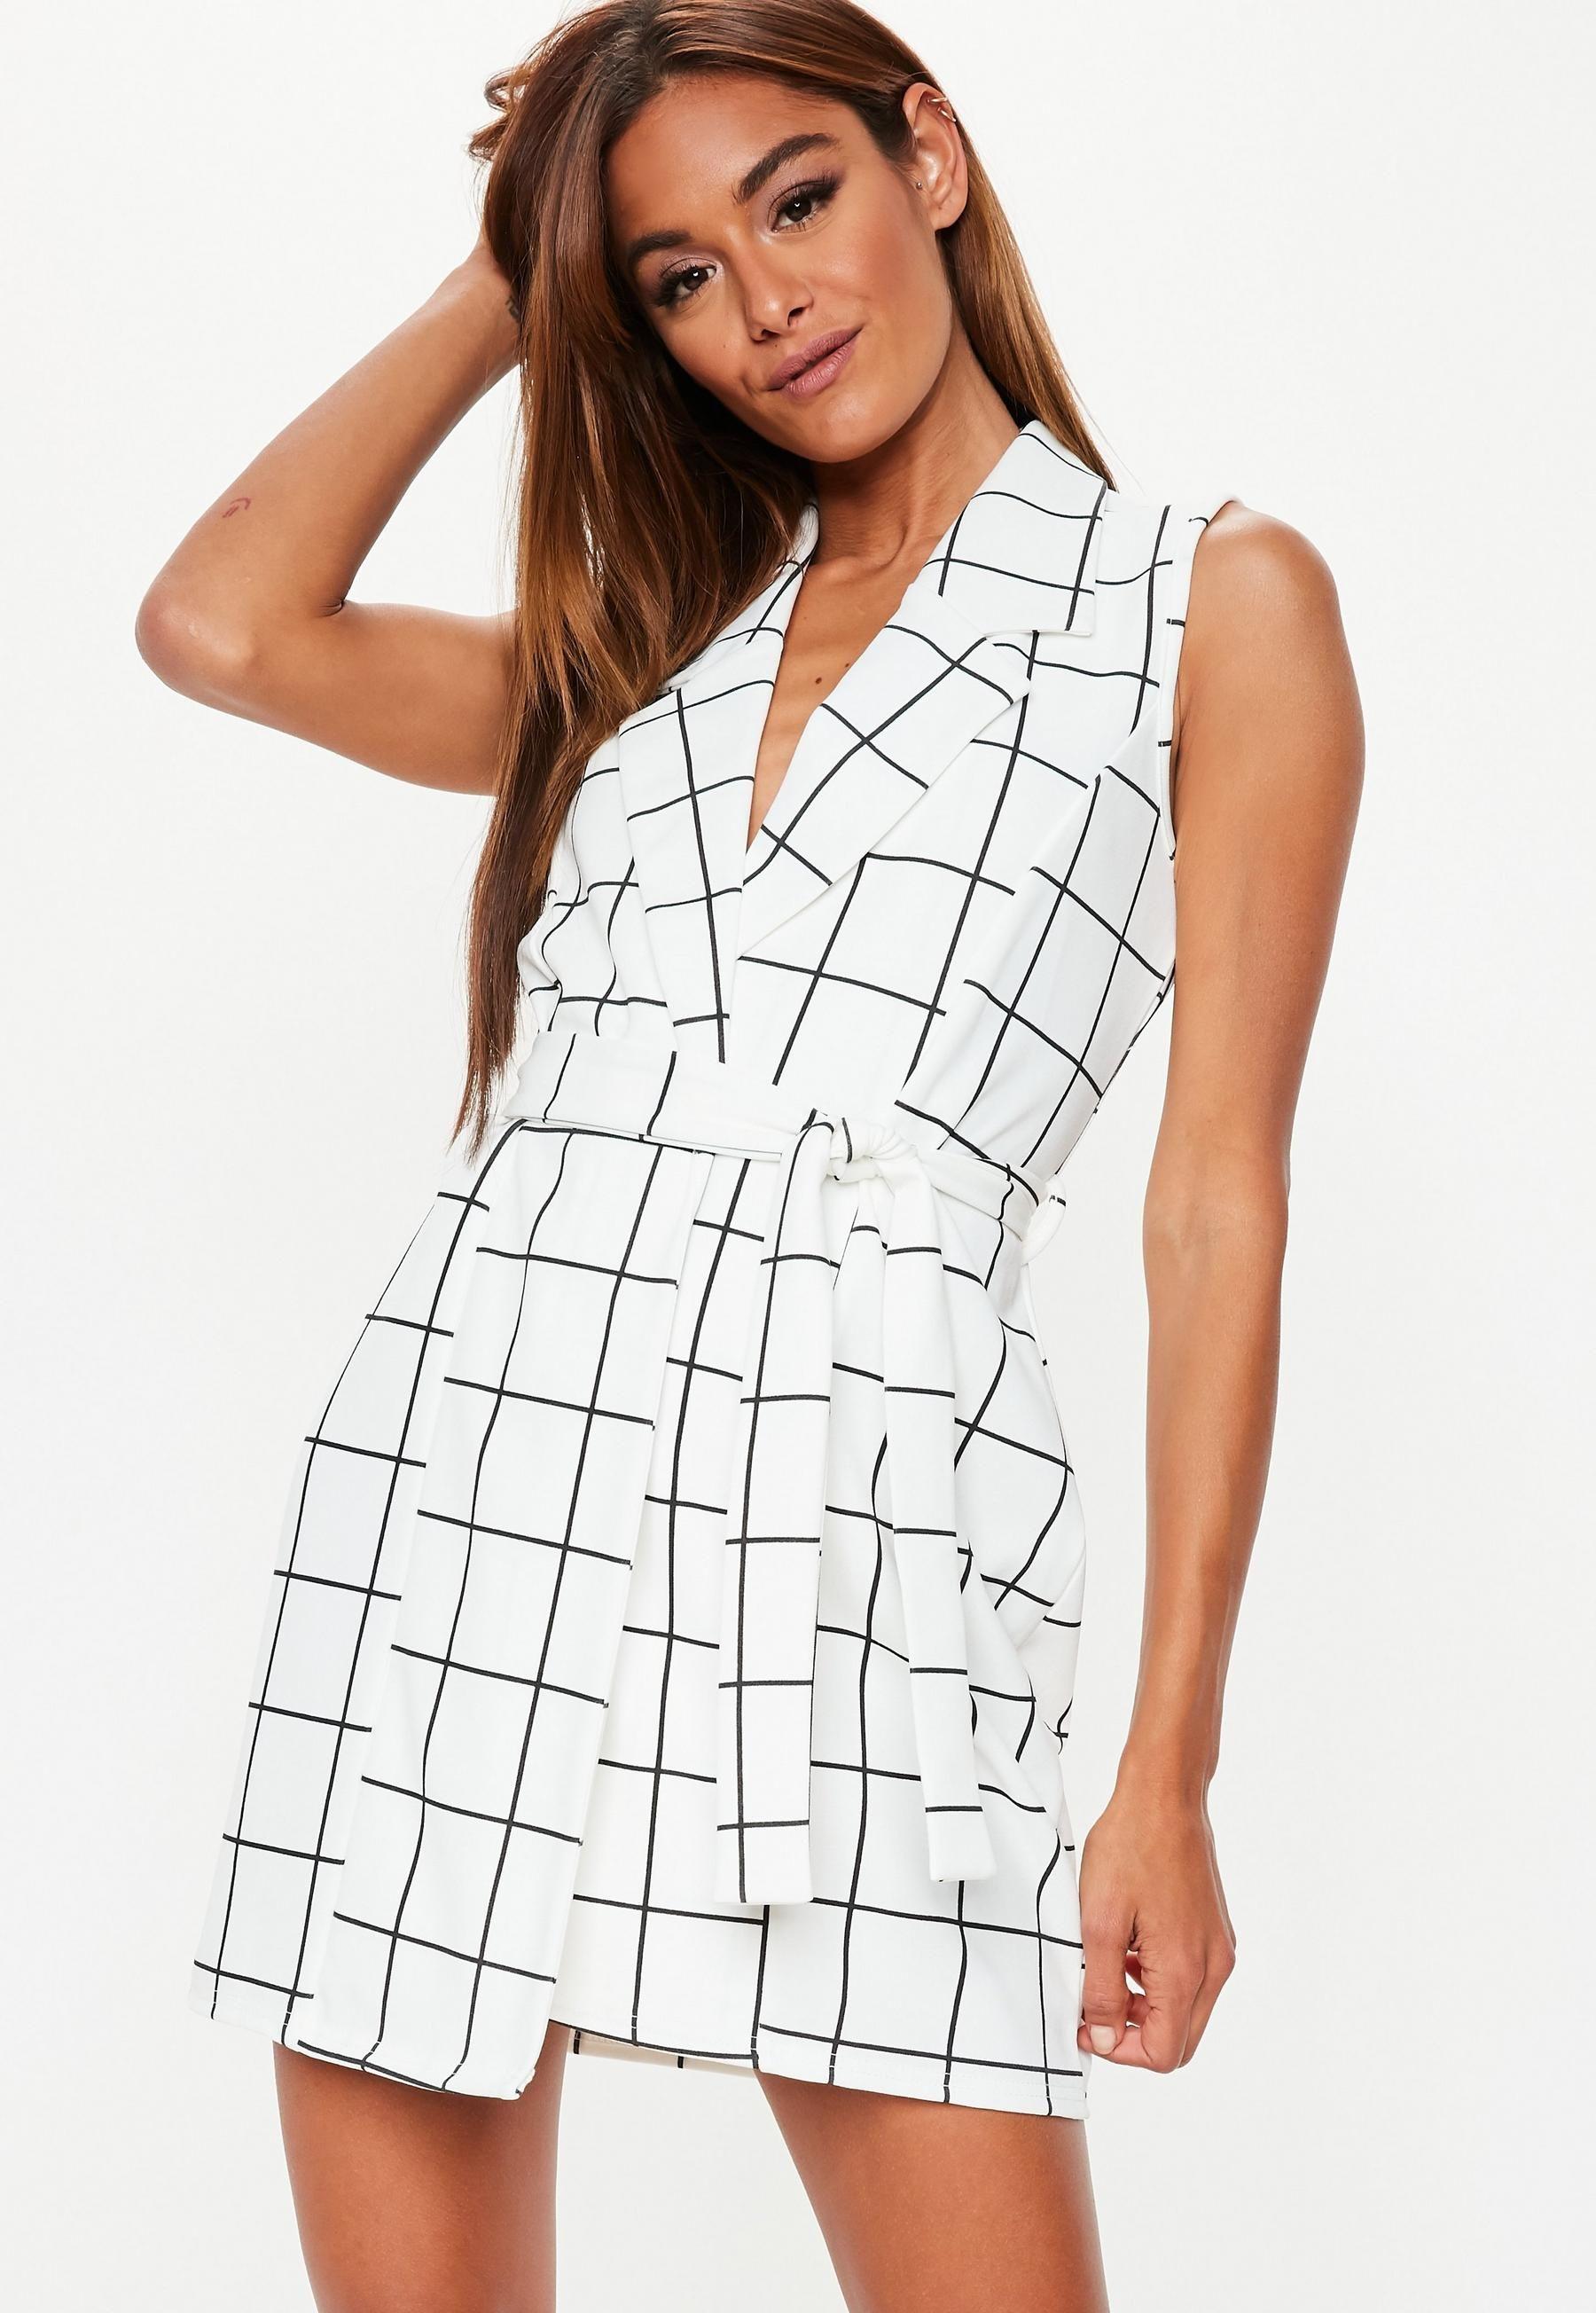 Biala Sukienka Marynarka Bez Rekawow Missguided Pleated Skater Dress Slinky Mini Dress Basic Maxi Dress